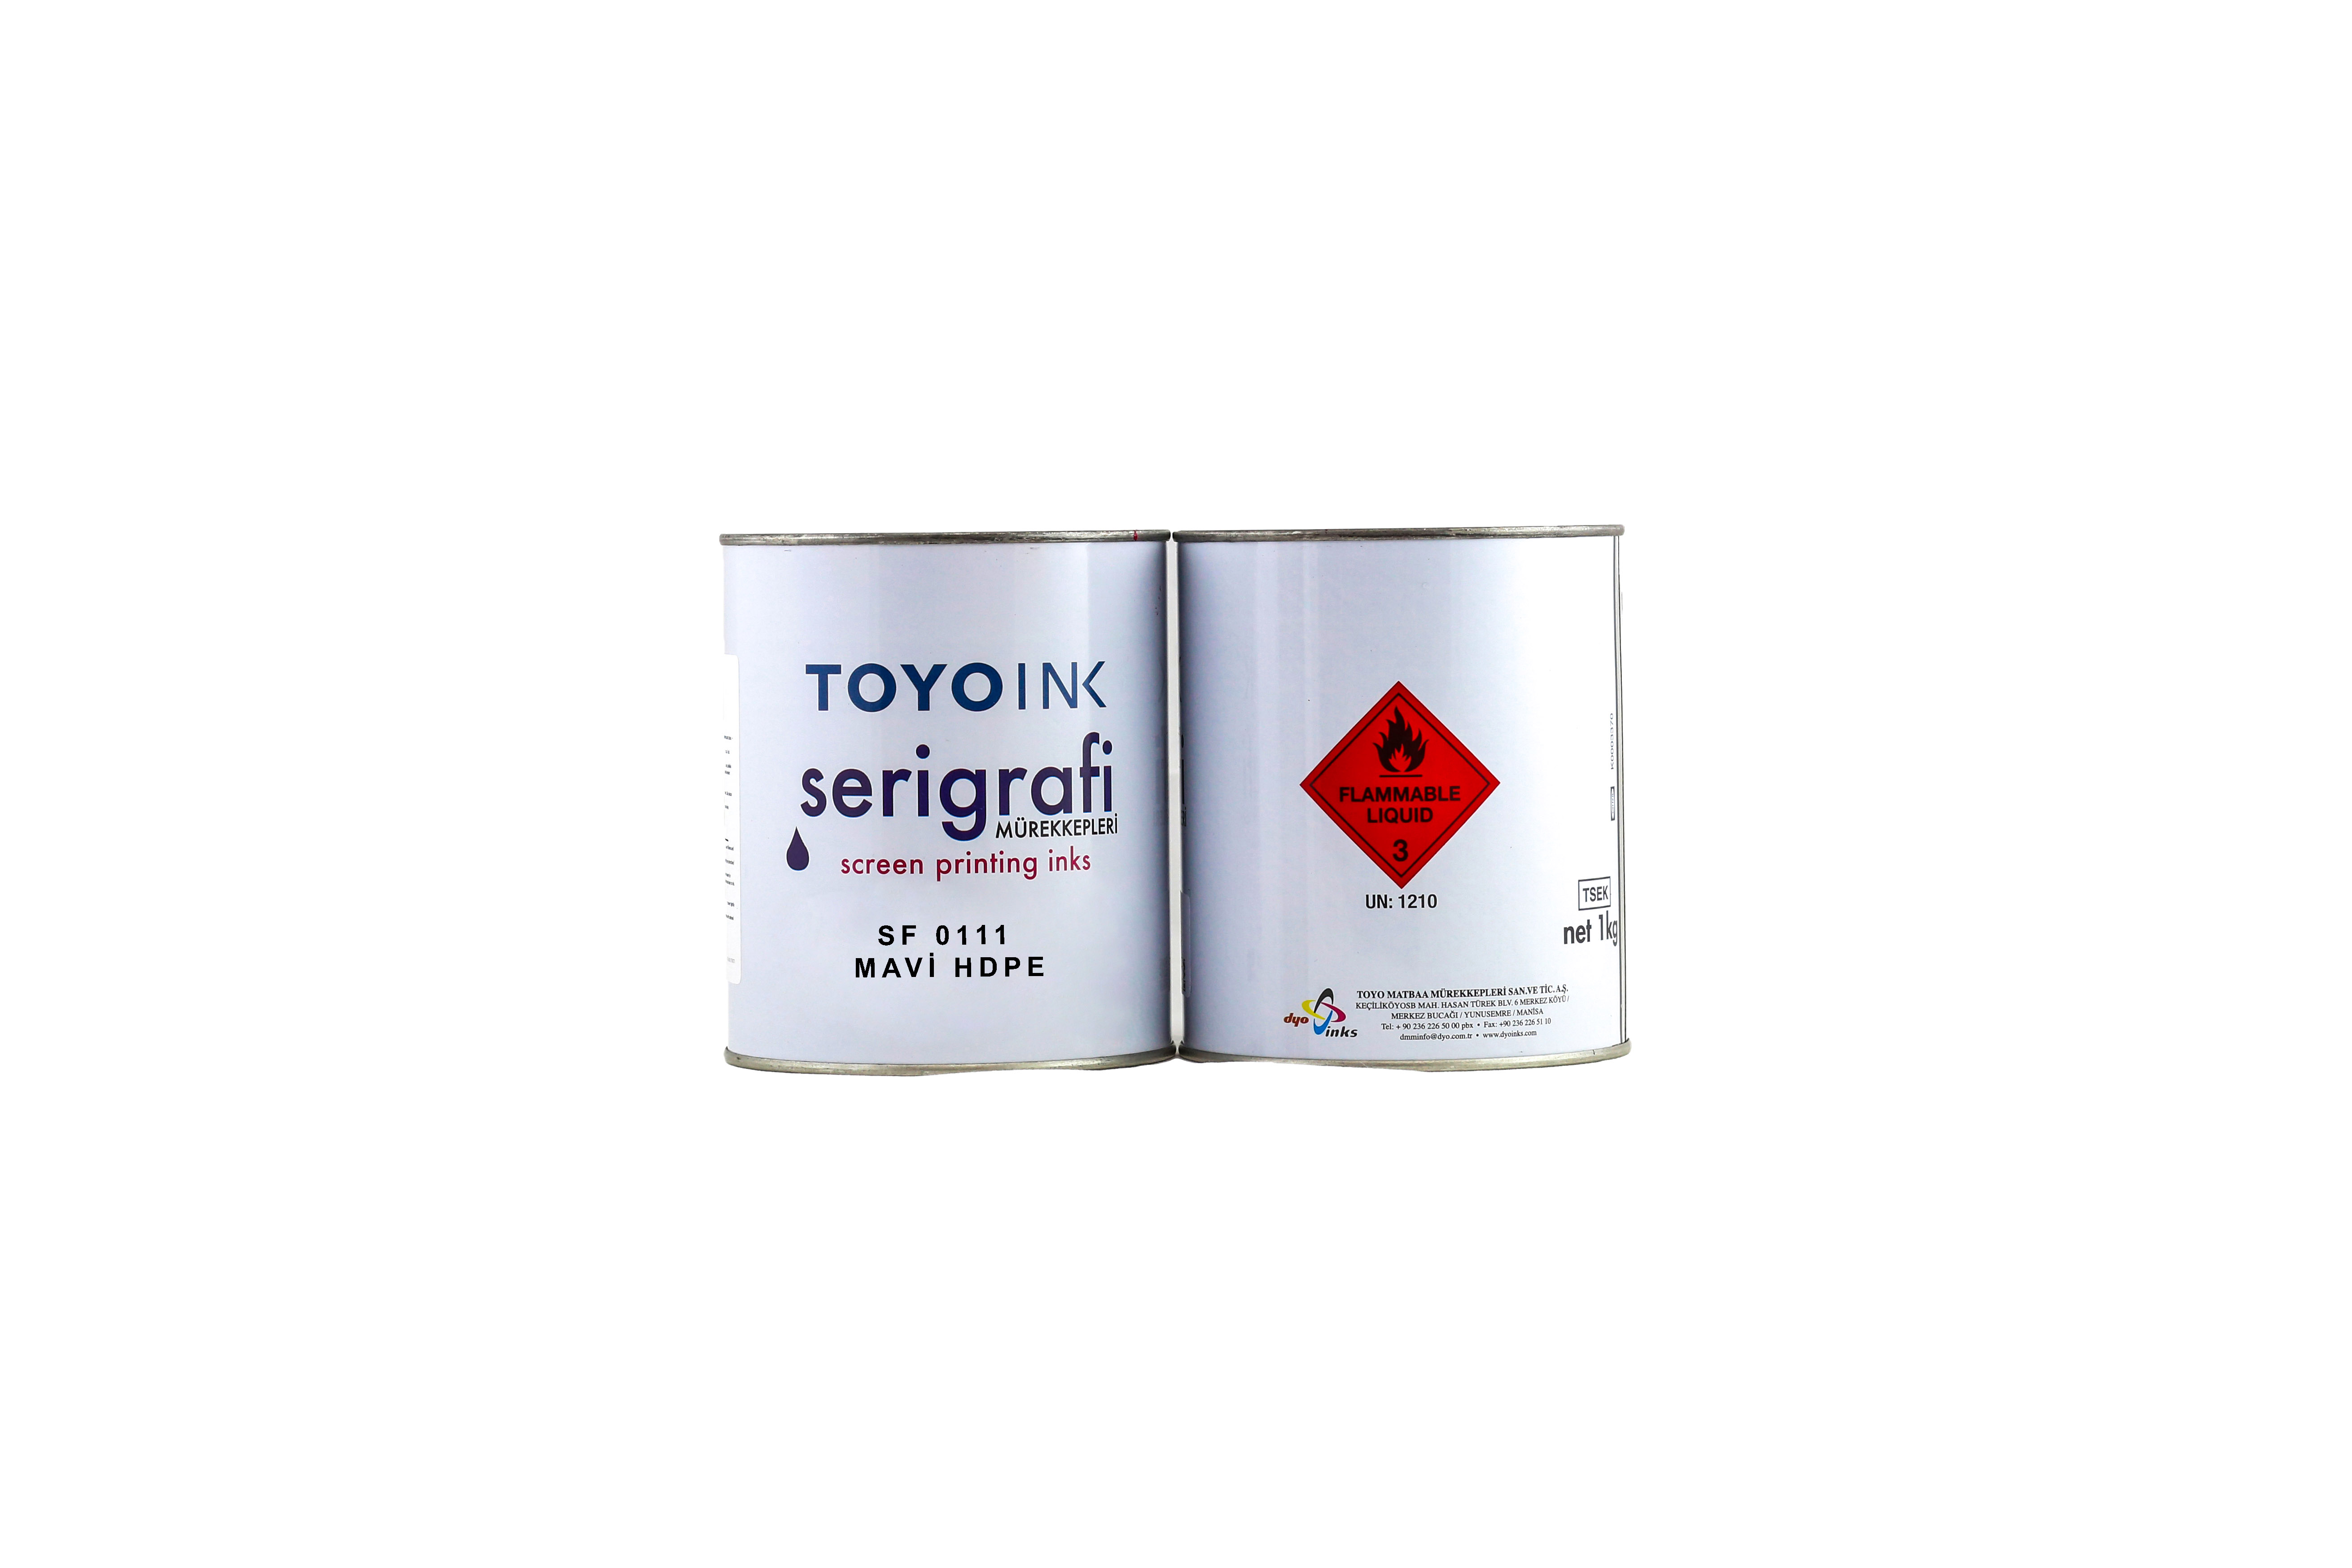 Toyo Ink - SF 0111 Mavi HDPE 1